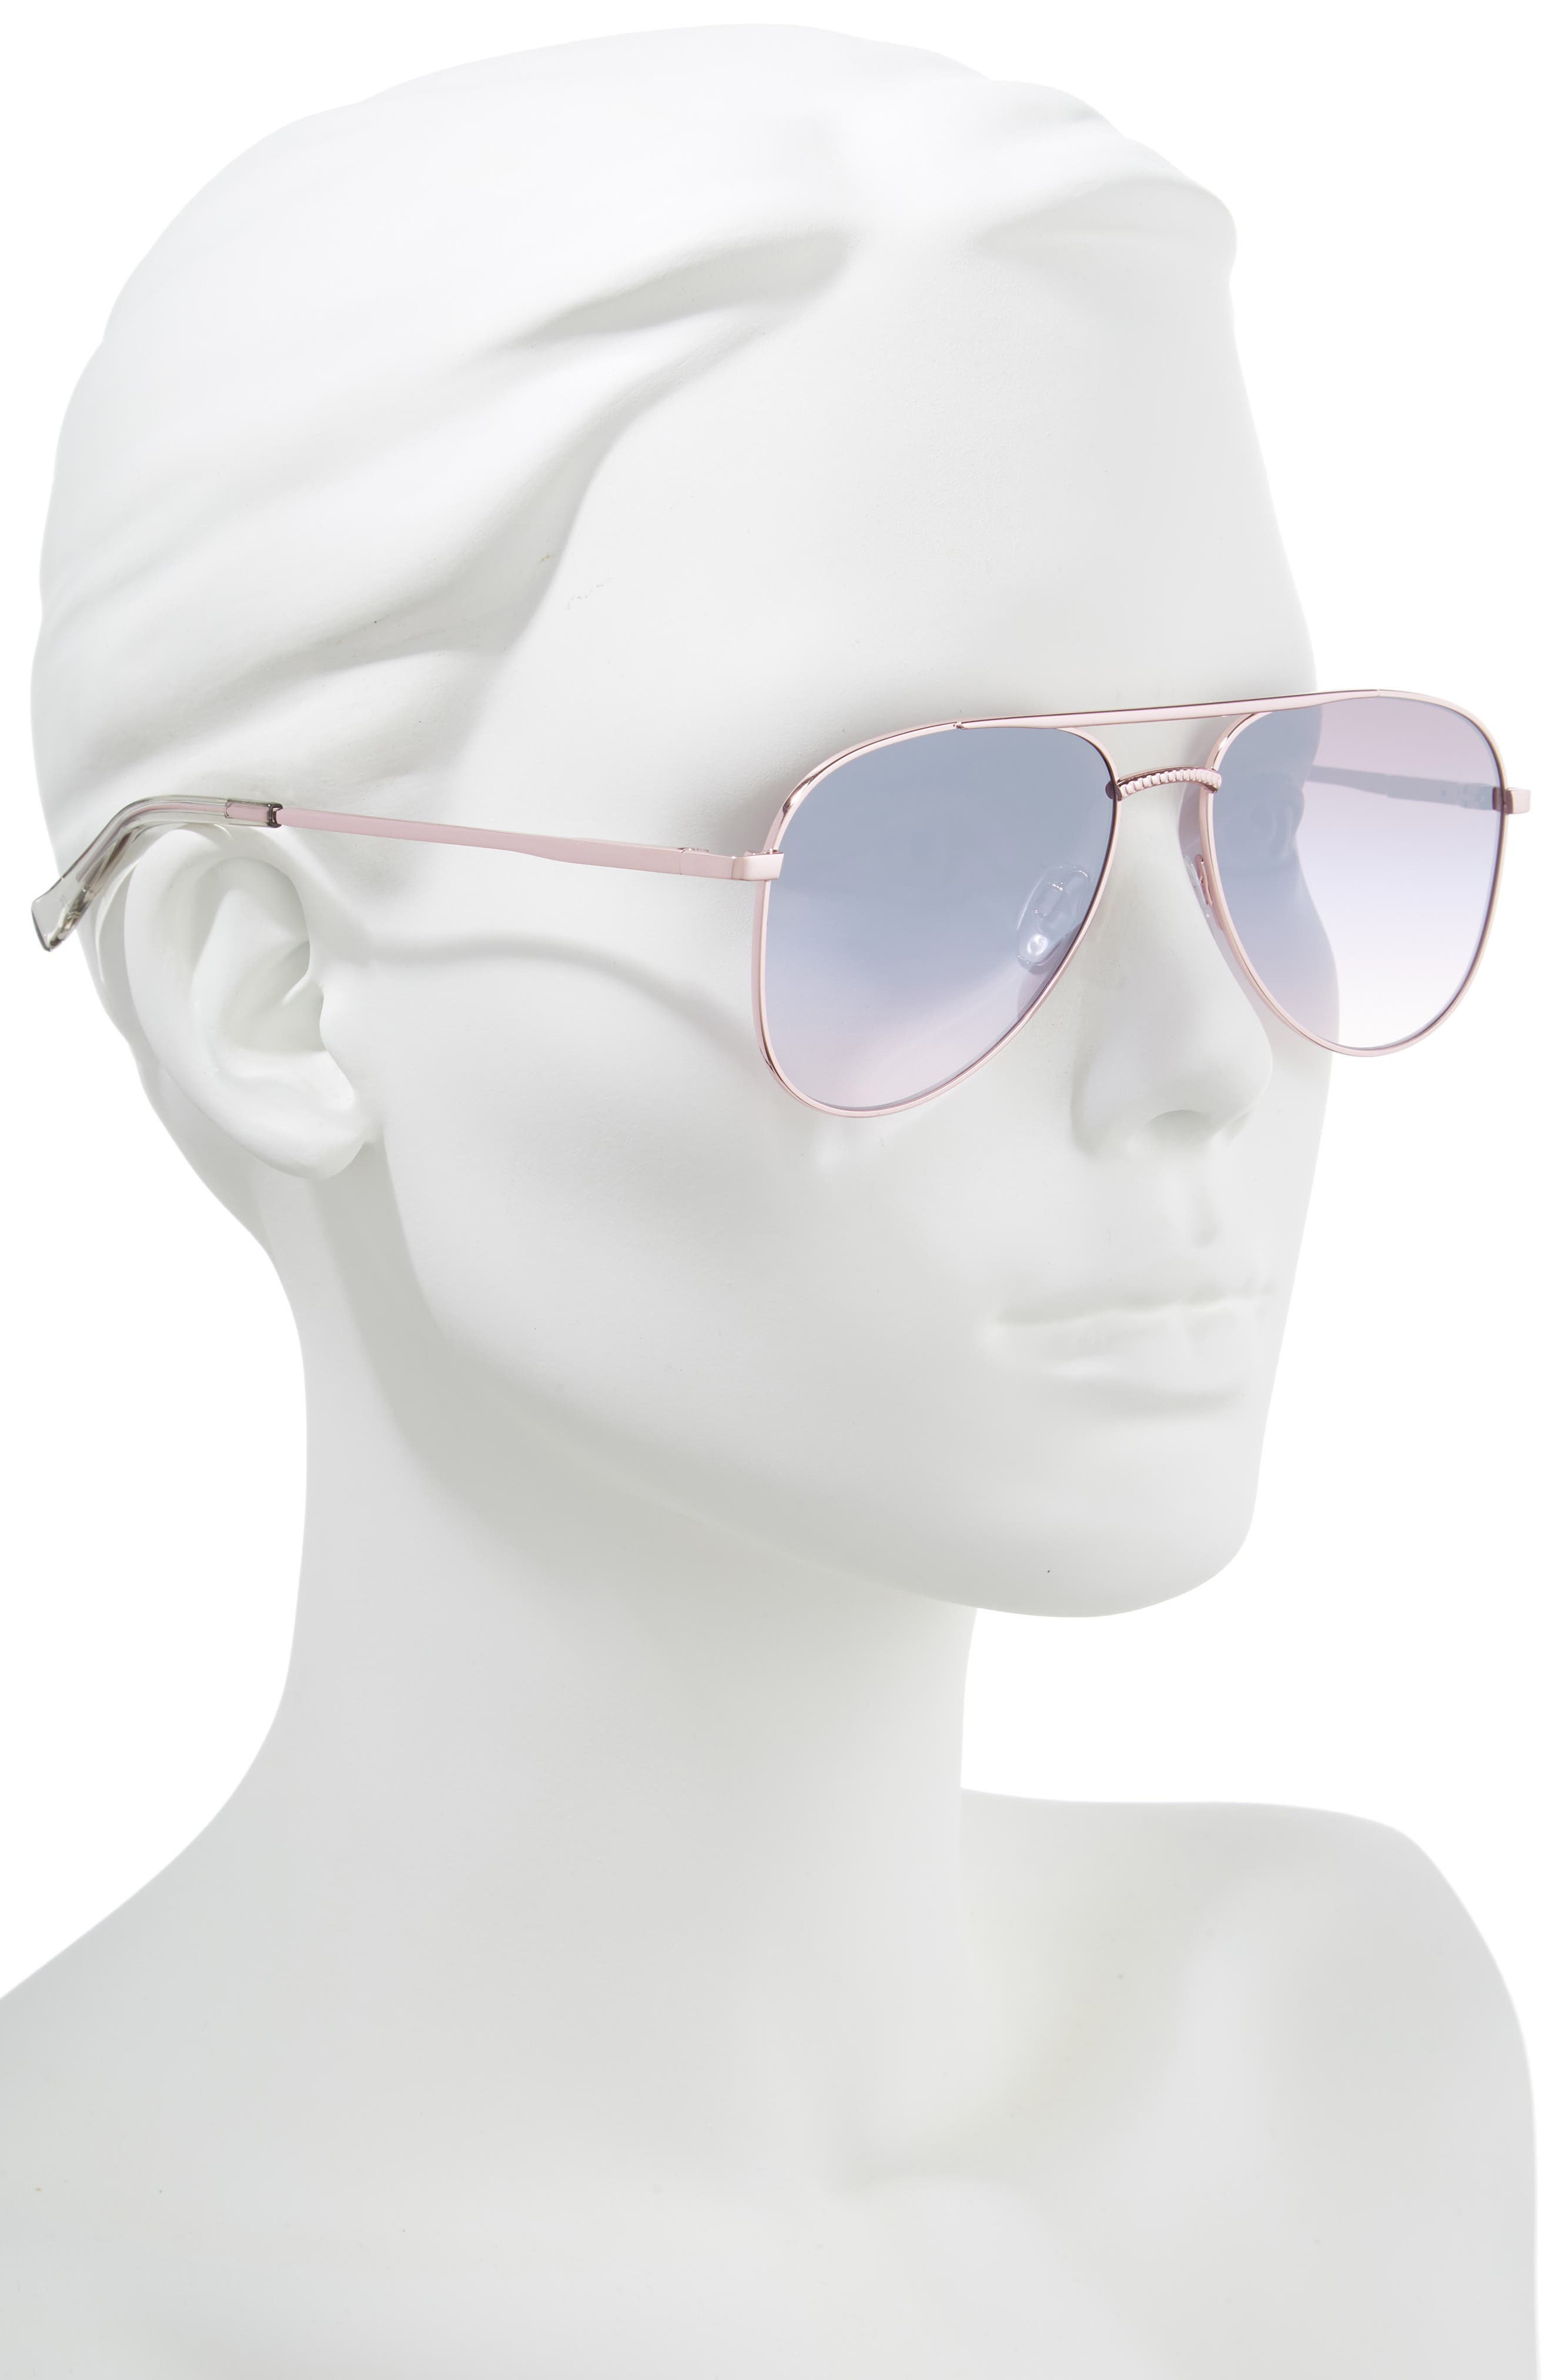 Kingdom 57mm Aviator Sunglasses,                             Alternate thumbnail 2, color,                             ROSE GOLD